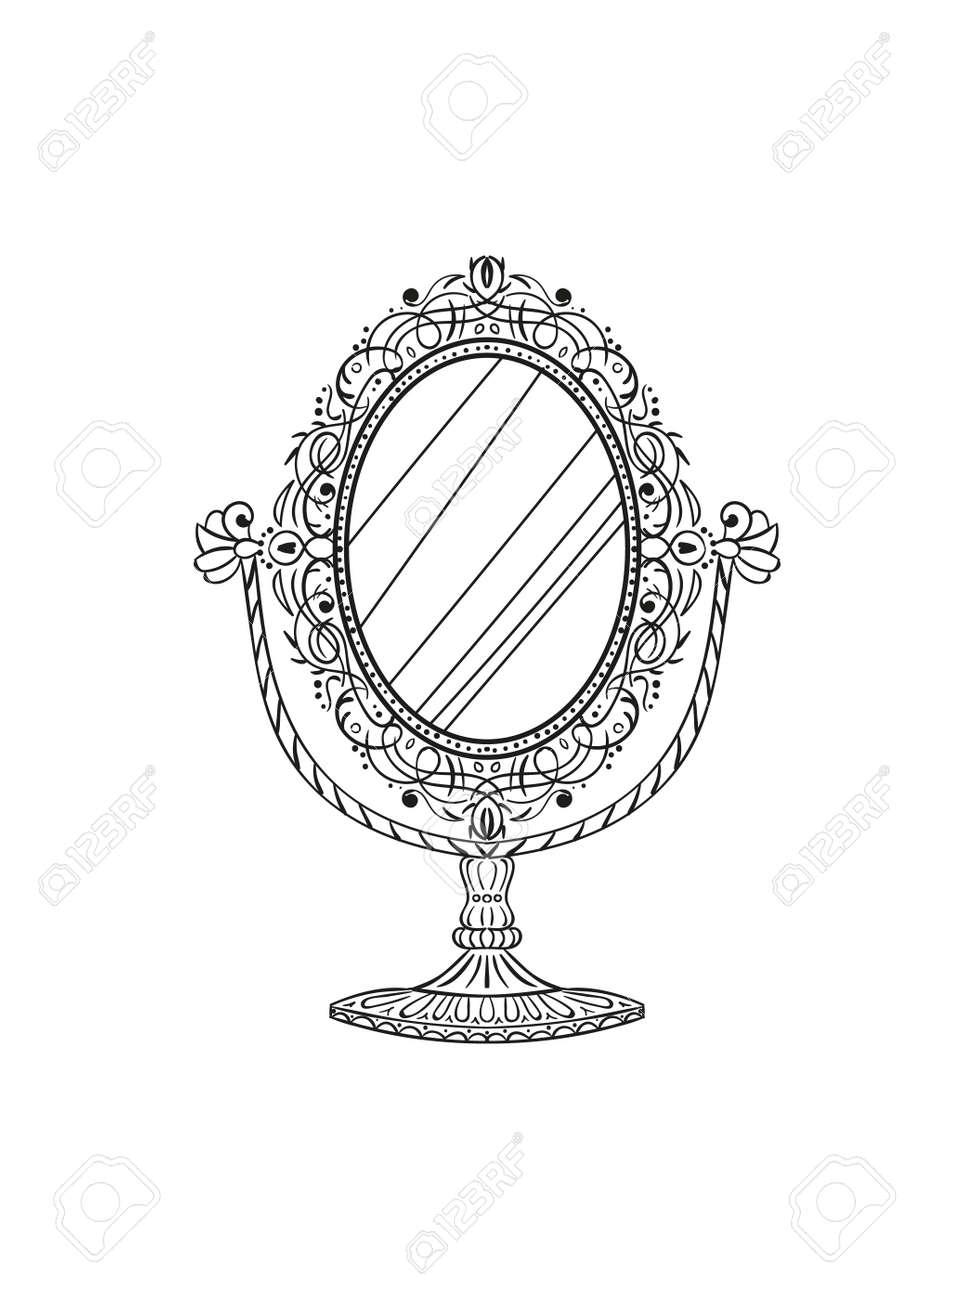 Freehand pencil drawing of a vintage table mirror. Sketchy antique baroque mirror. Vector illustration. - 166906106